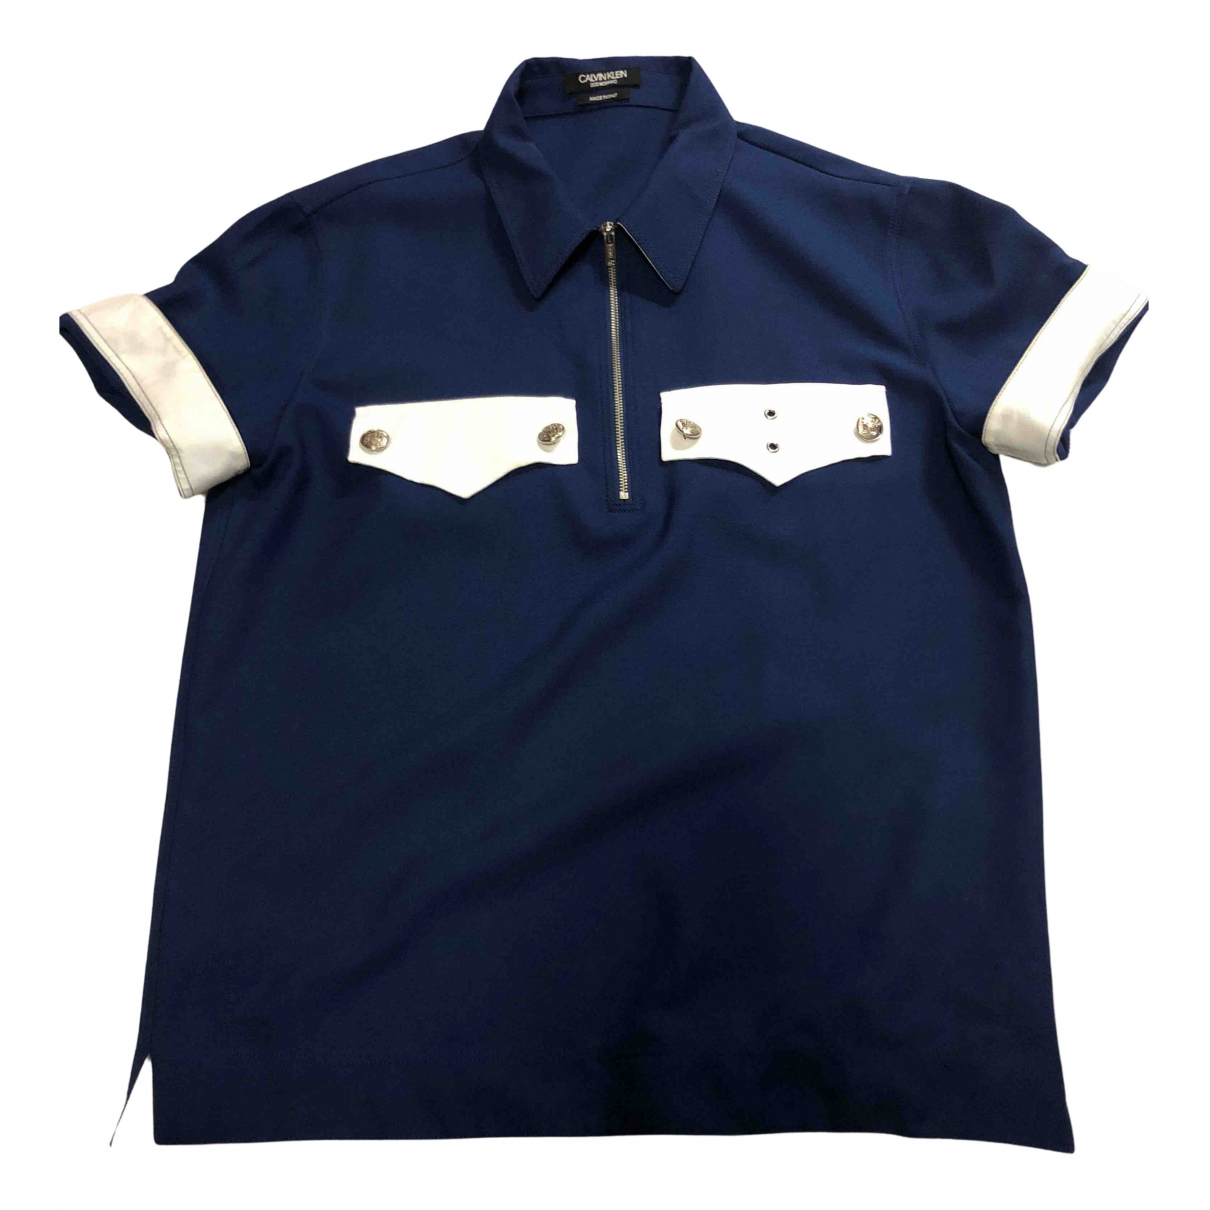 Calvin Klein 205w39nyc N Navy Shirts for Men L International